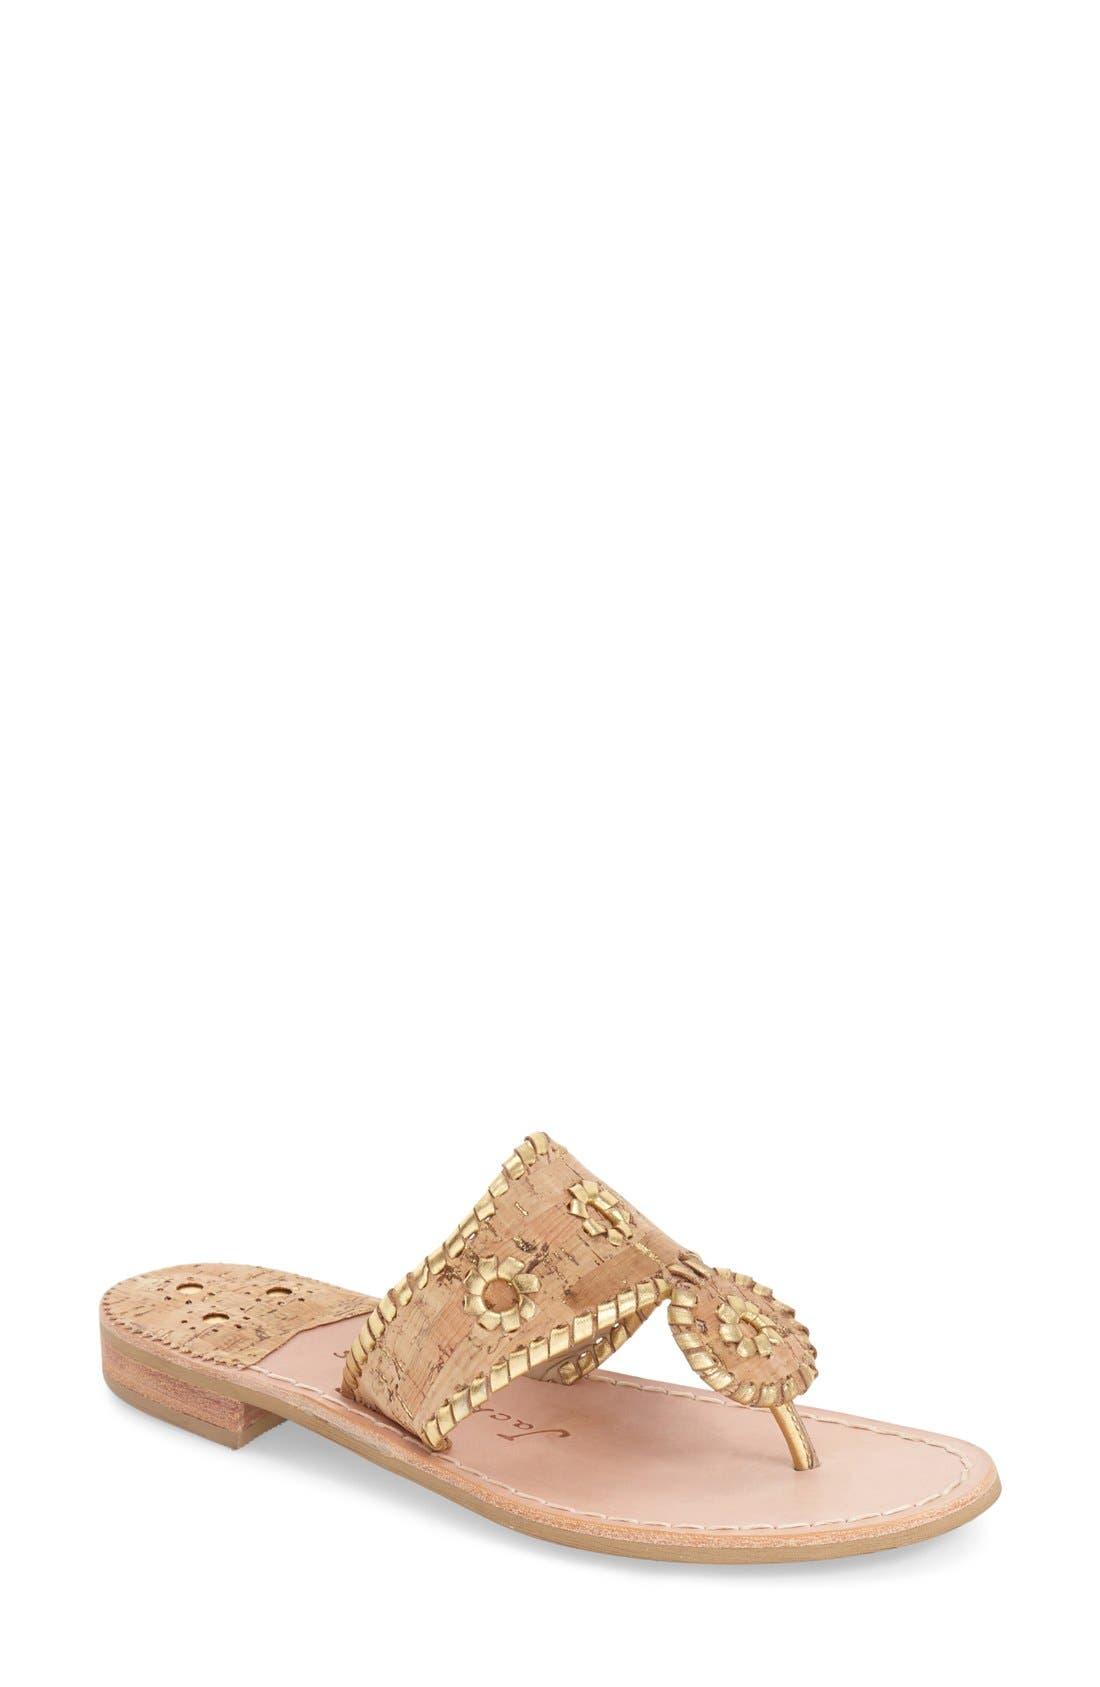 Whipstitched Flip Flop,                         Main,                         color, CORK/ GOLD